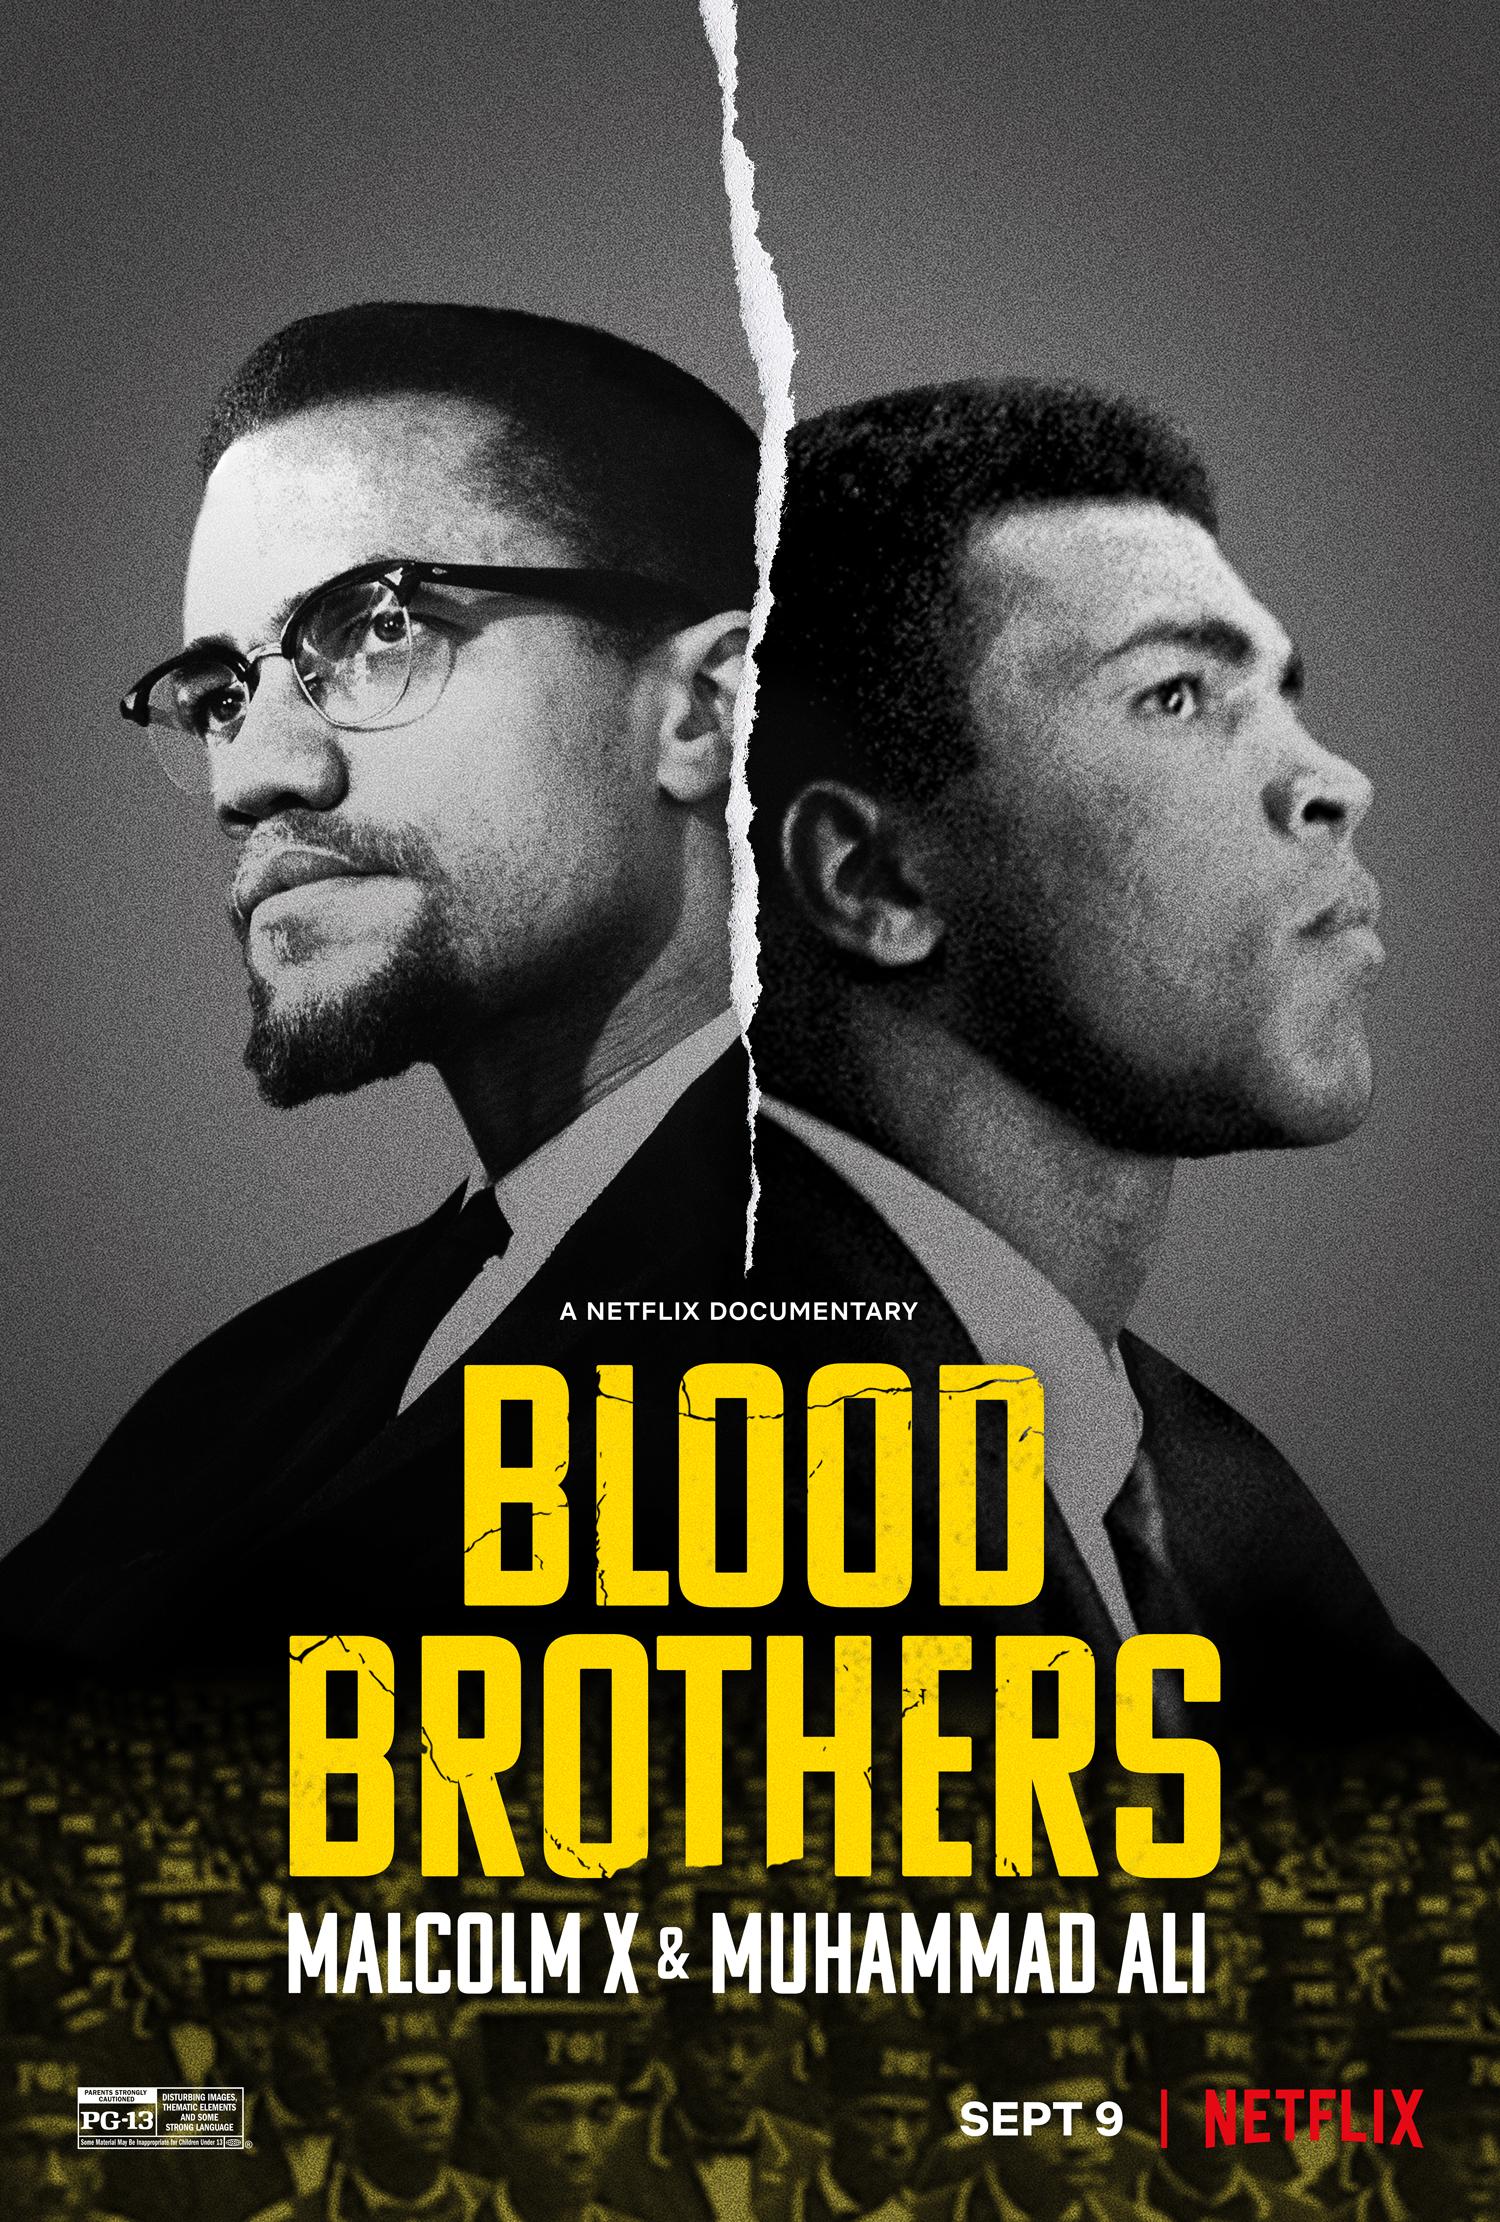 Blood Brothers, Netflix, Malcolm X and Muhammad Ali